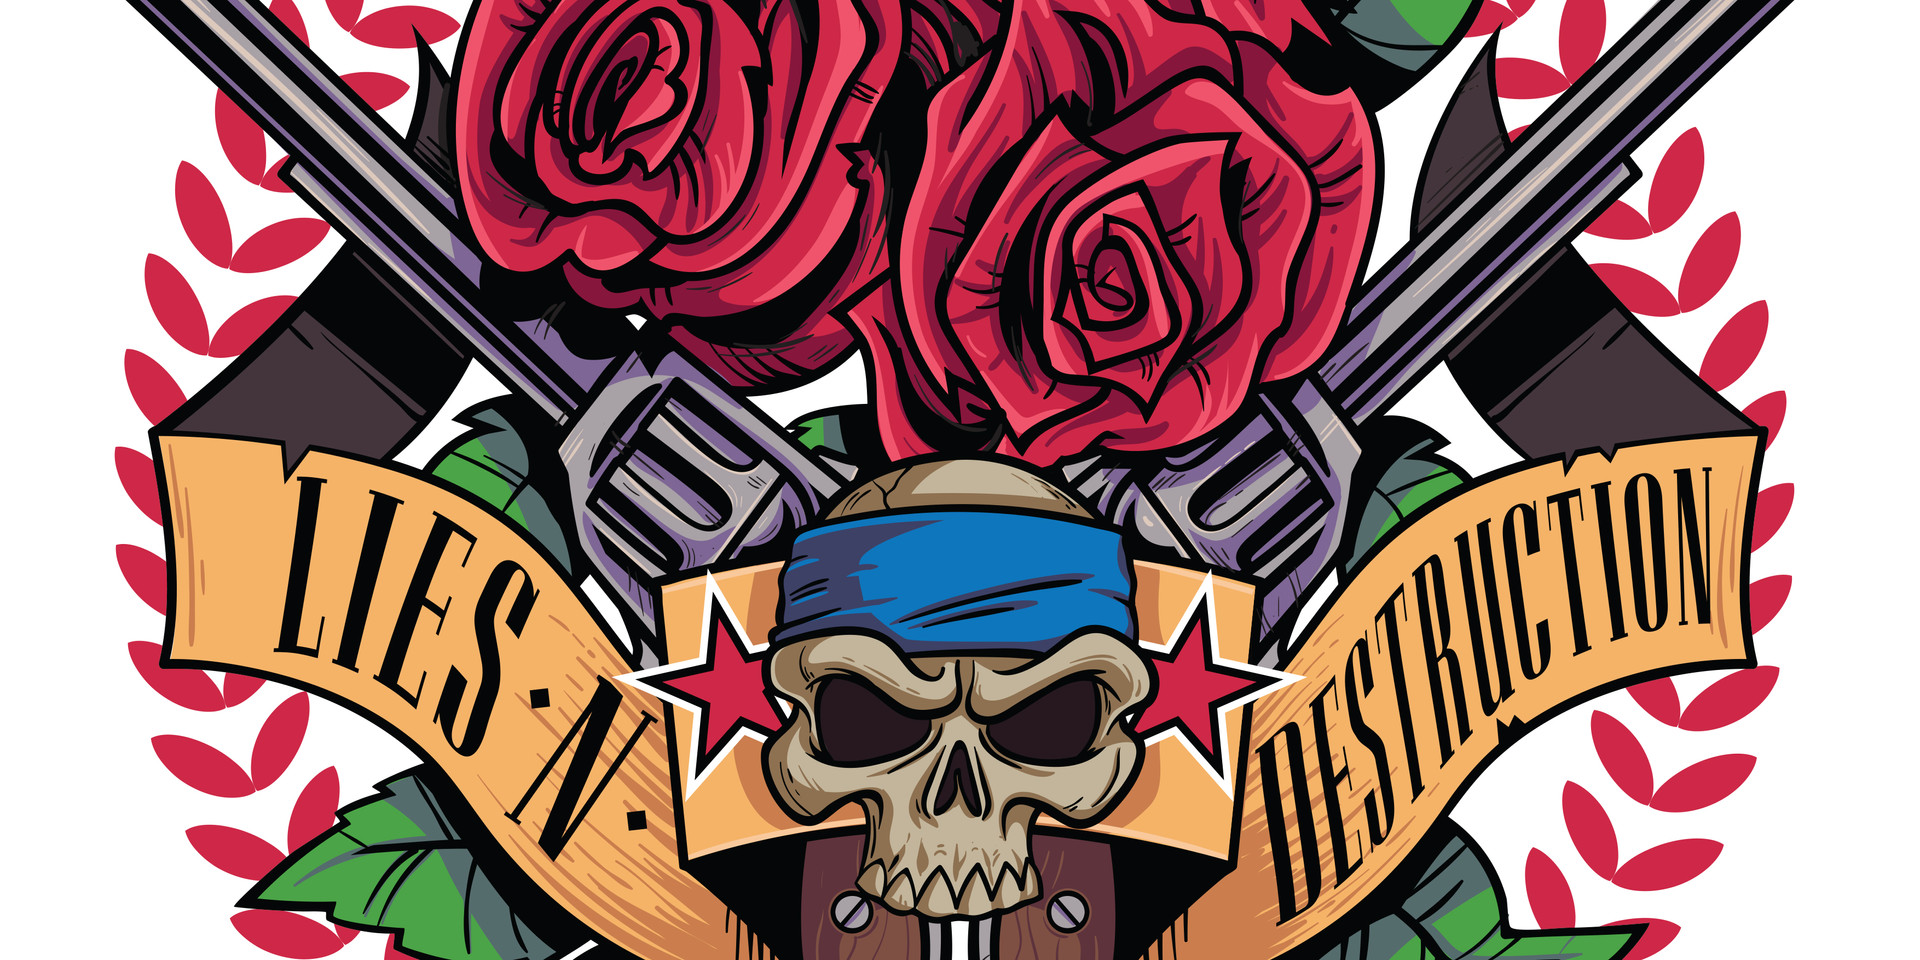 Lies N' Destruction Skull, Roses and Gun Logo